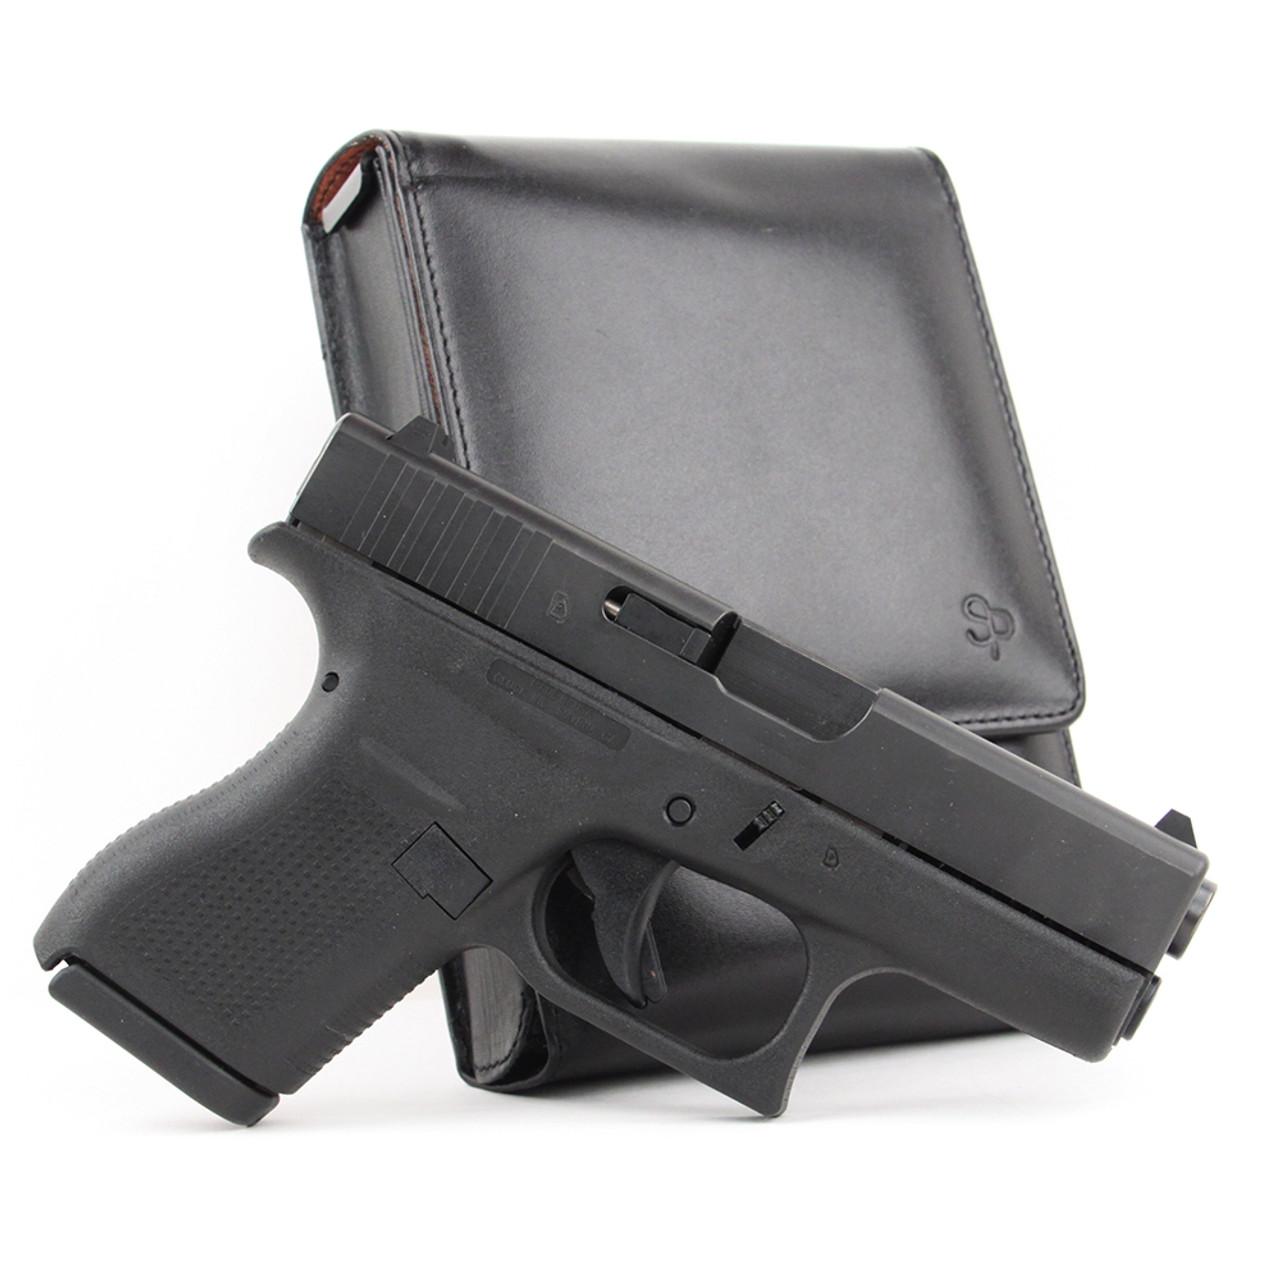 Glock 43 Concealed Carry Holster (Belt Loop)